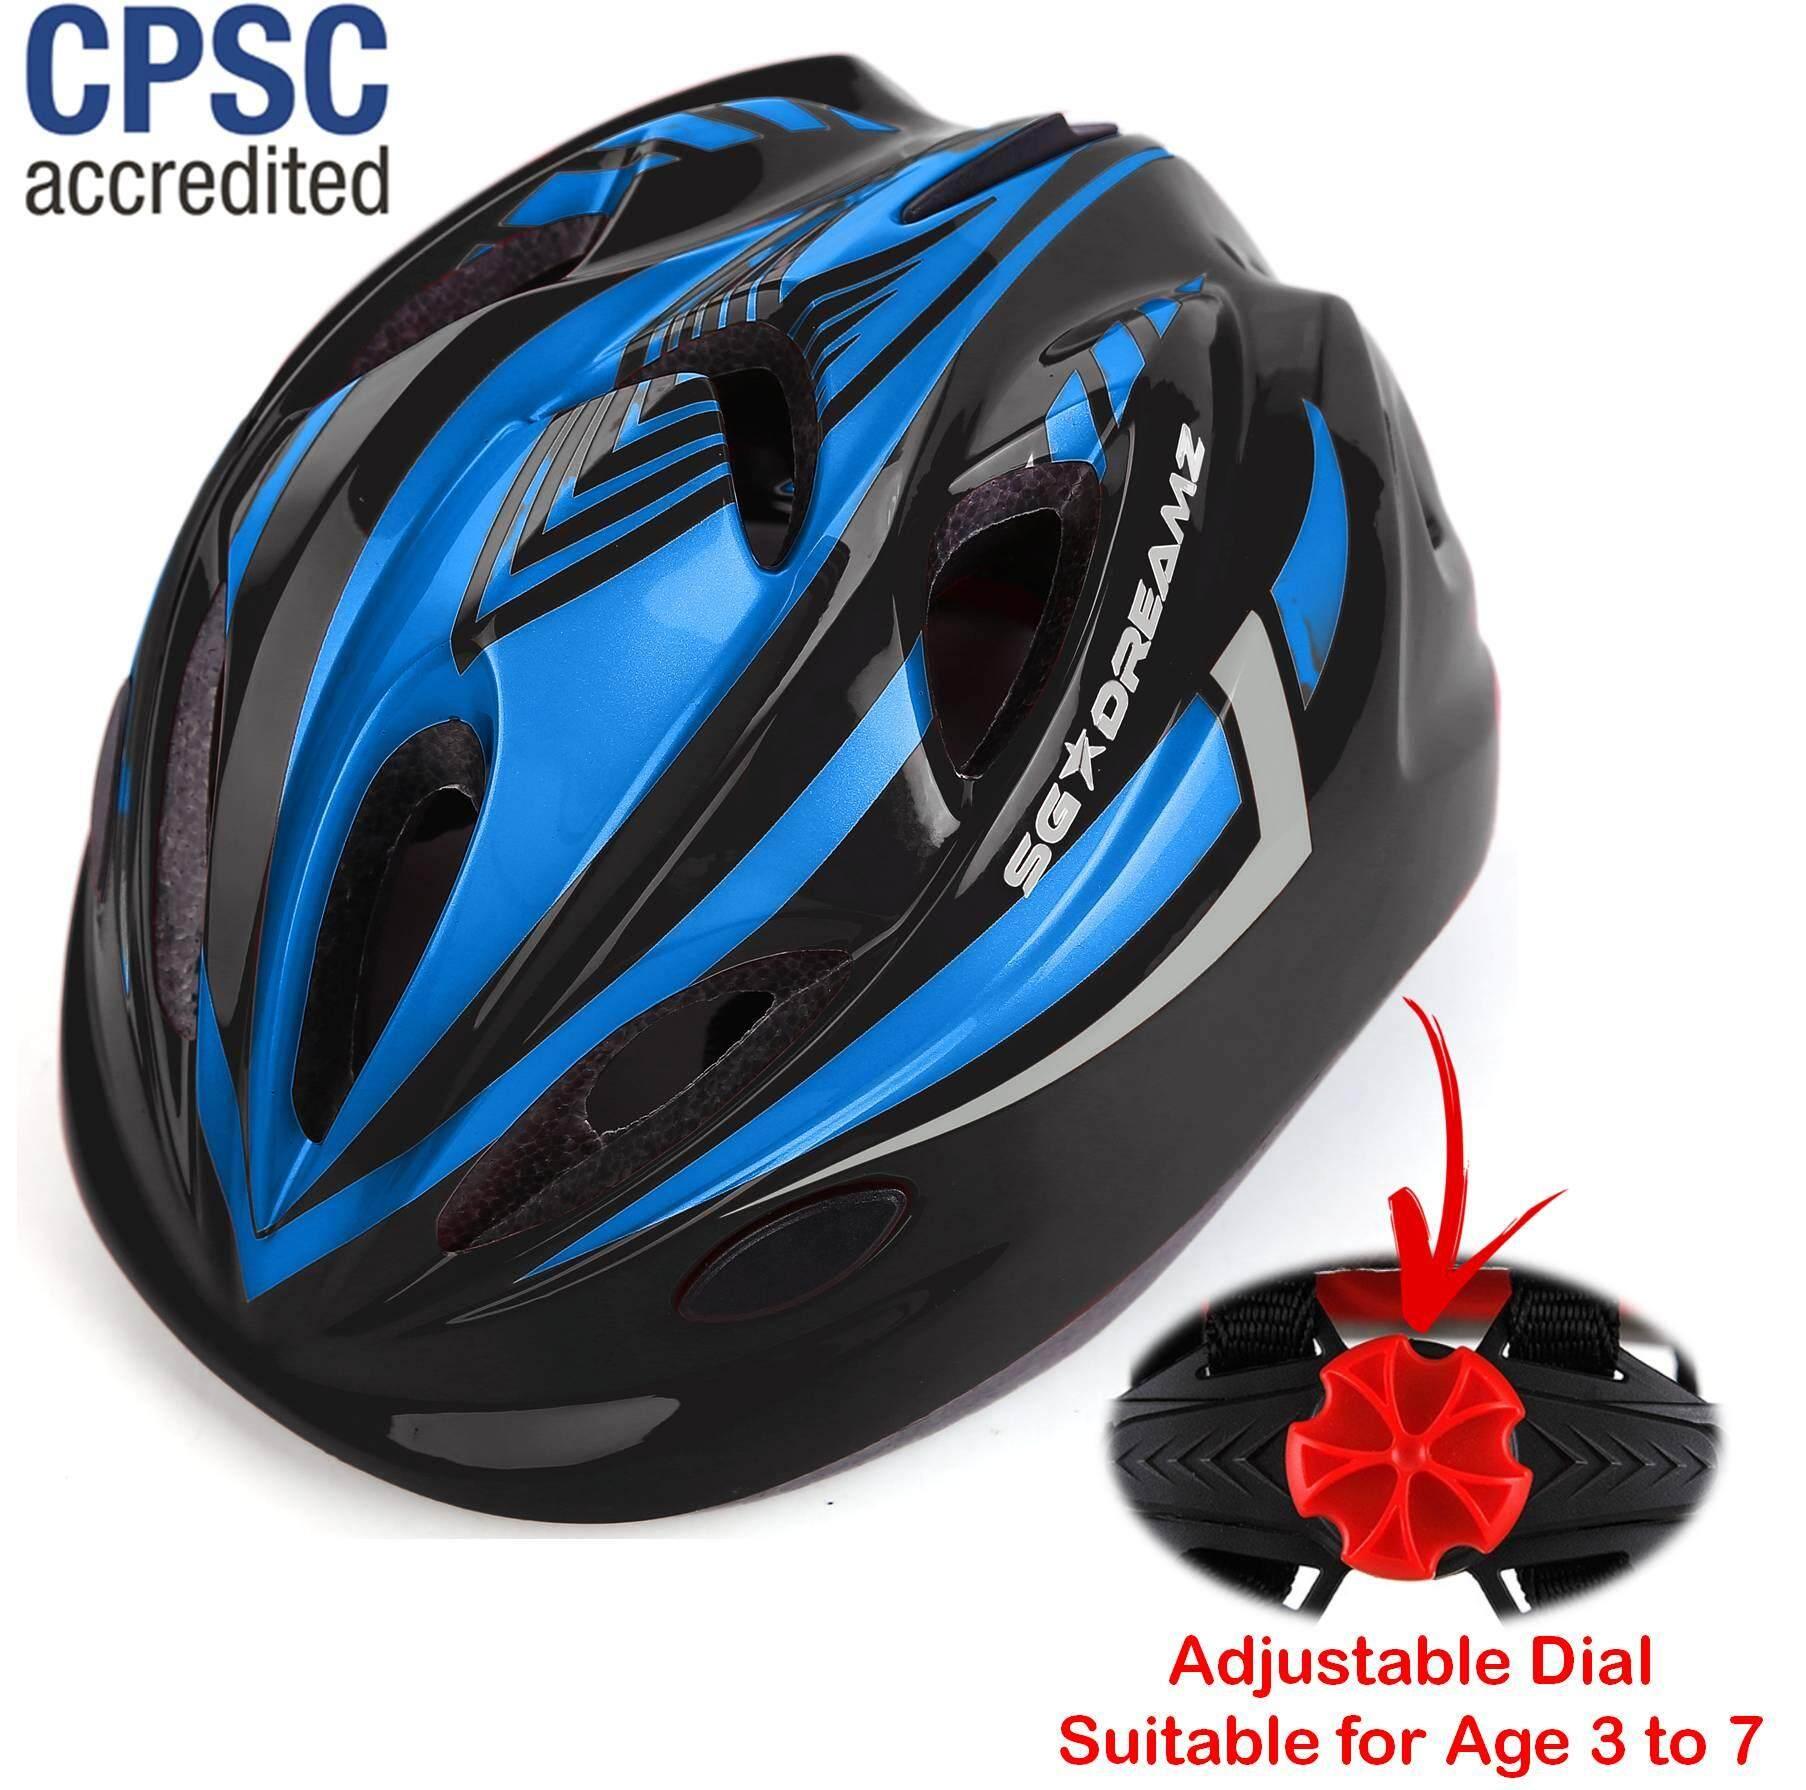 Bicycle FEI YU Kids Helmet Boys and Girls Adjustable Comfortable Ultralight Helmet Children Multi-Sport Safety Helmets for Roller Scooter Skateboard